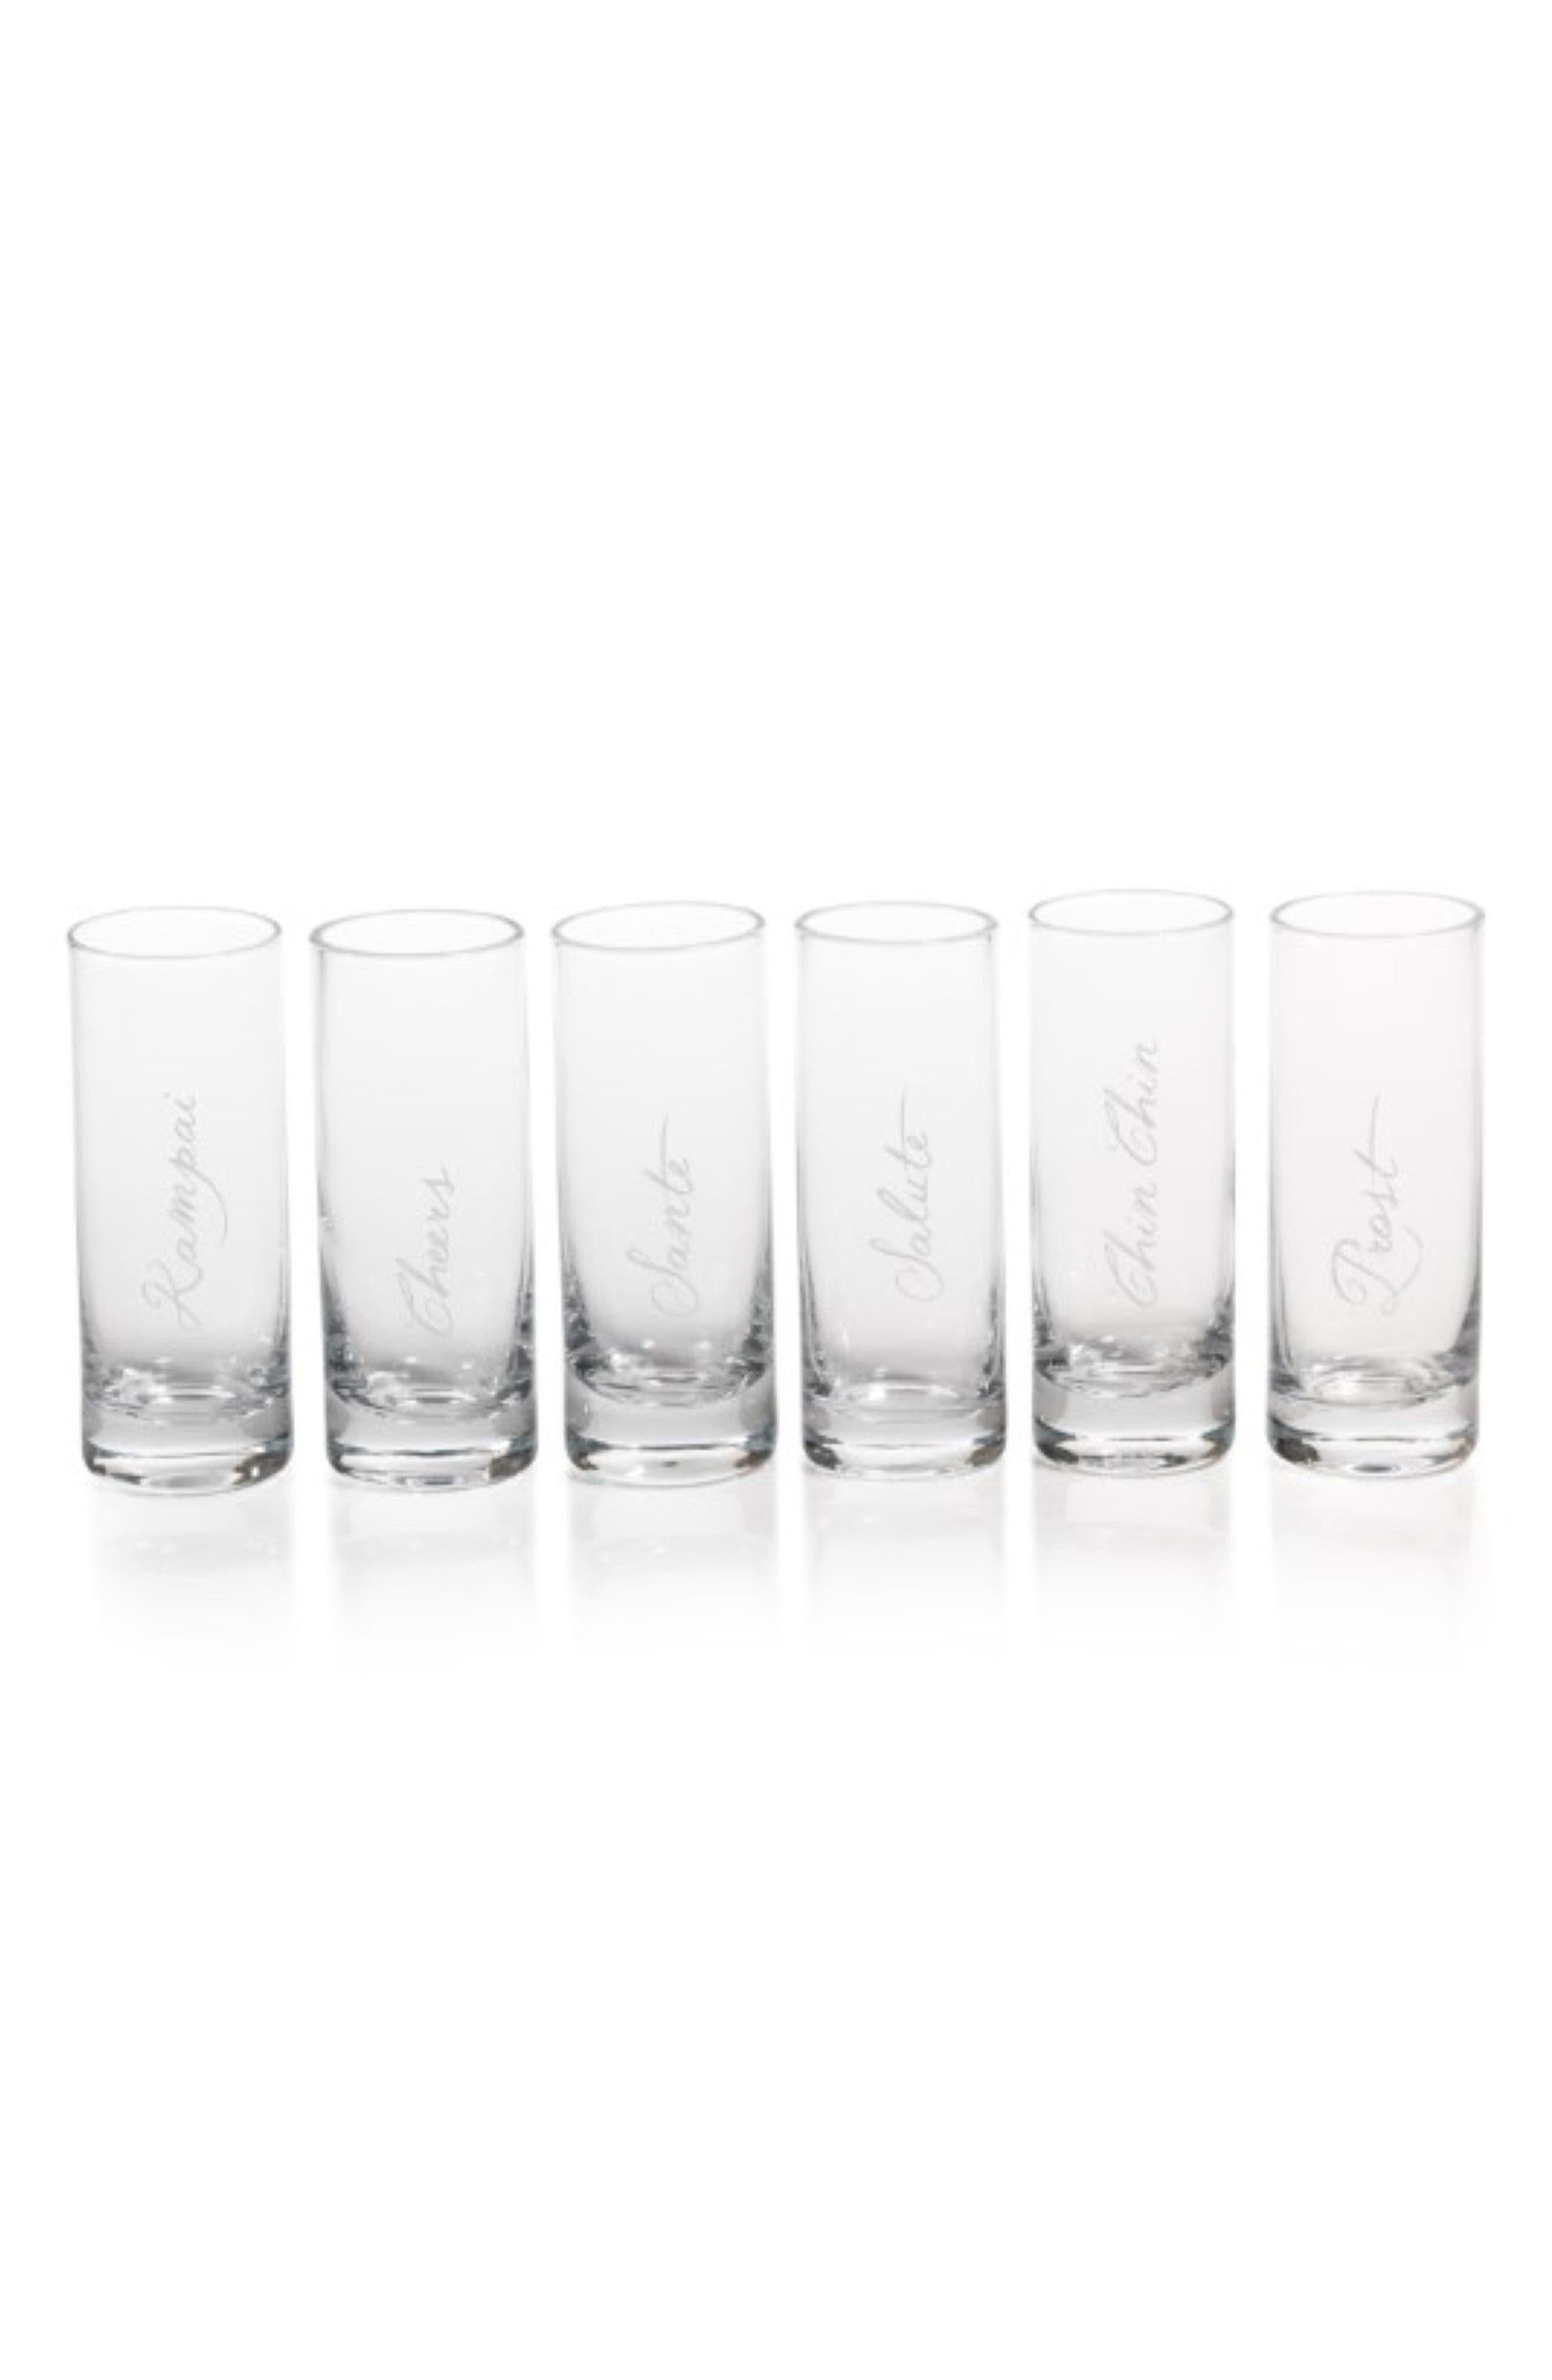 Tula Celebration Set of 6 Shot Glasses,                             Main thumbnail 1, color,                             Clear